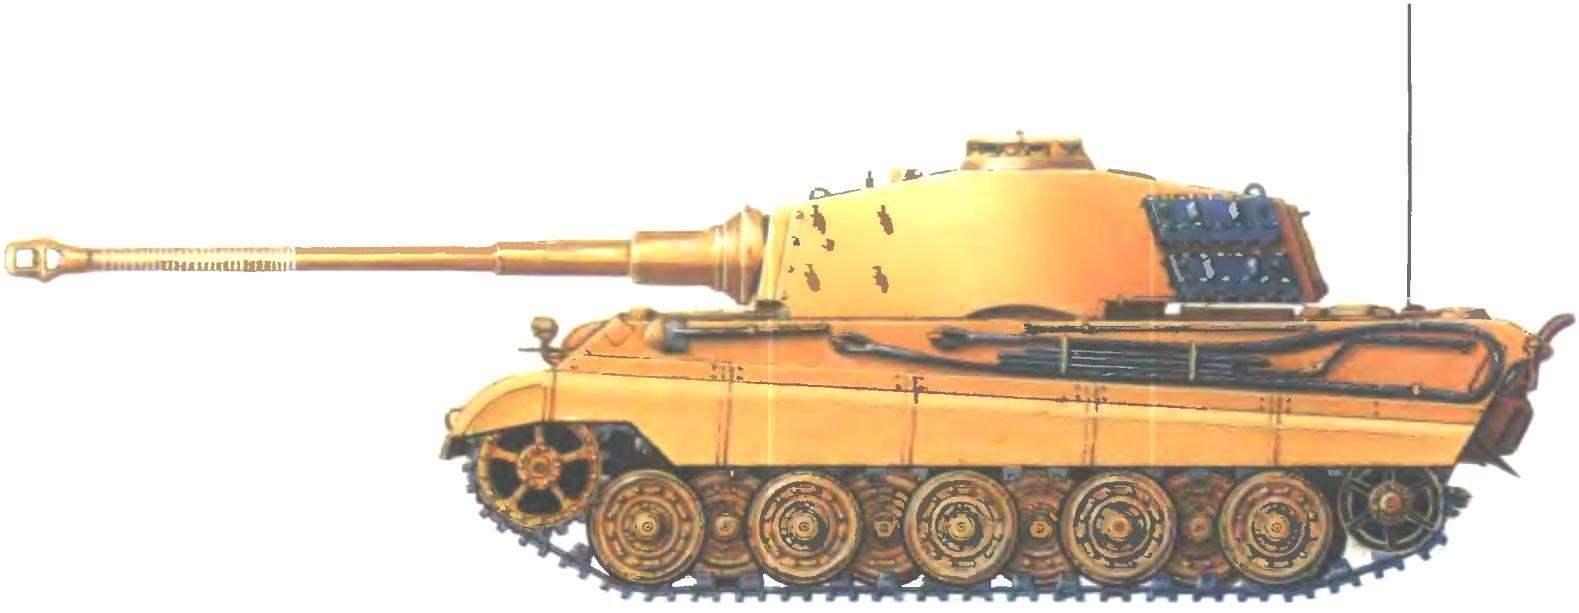 Pz. VI Ausf.B. 503-й тяжелый танковый батальон СС. Район Данцига, март 1945 года